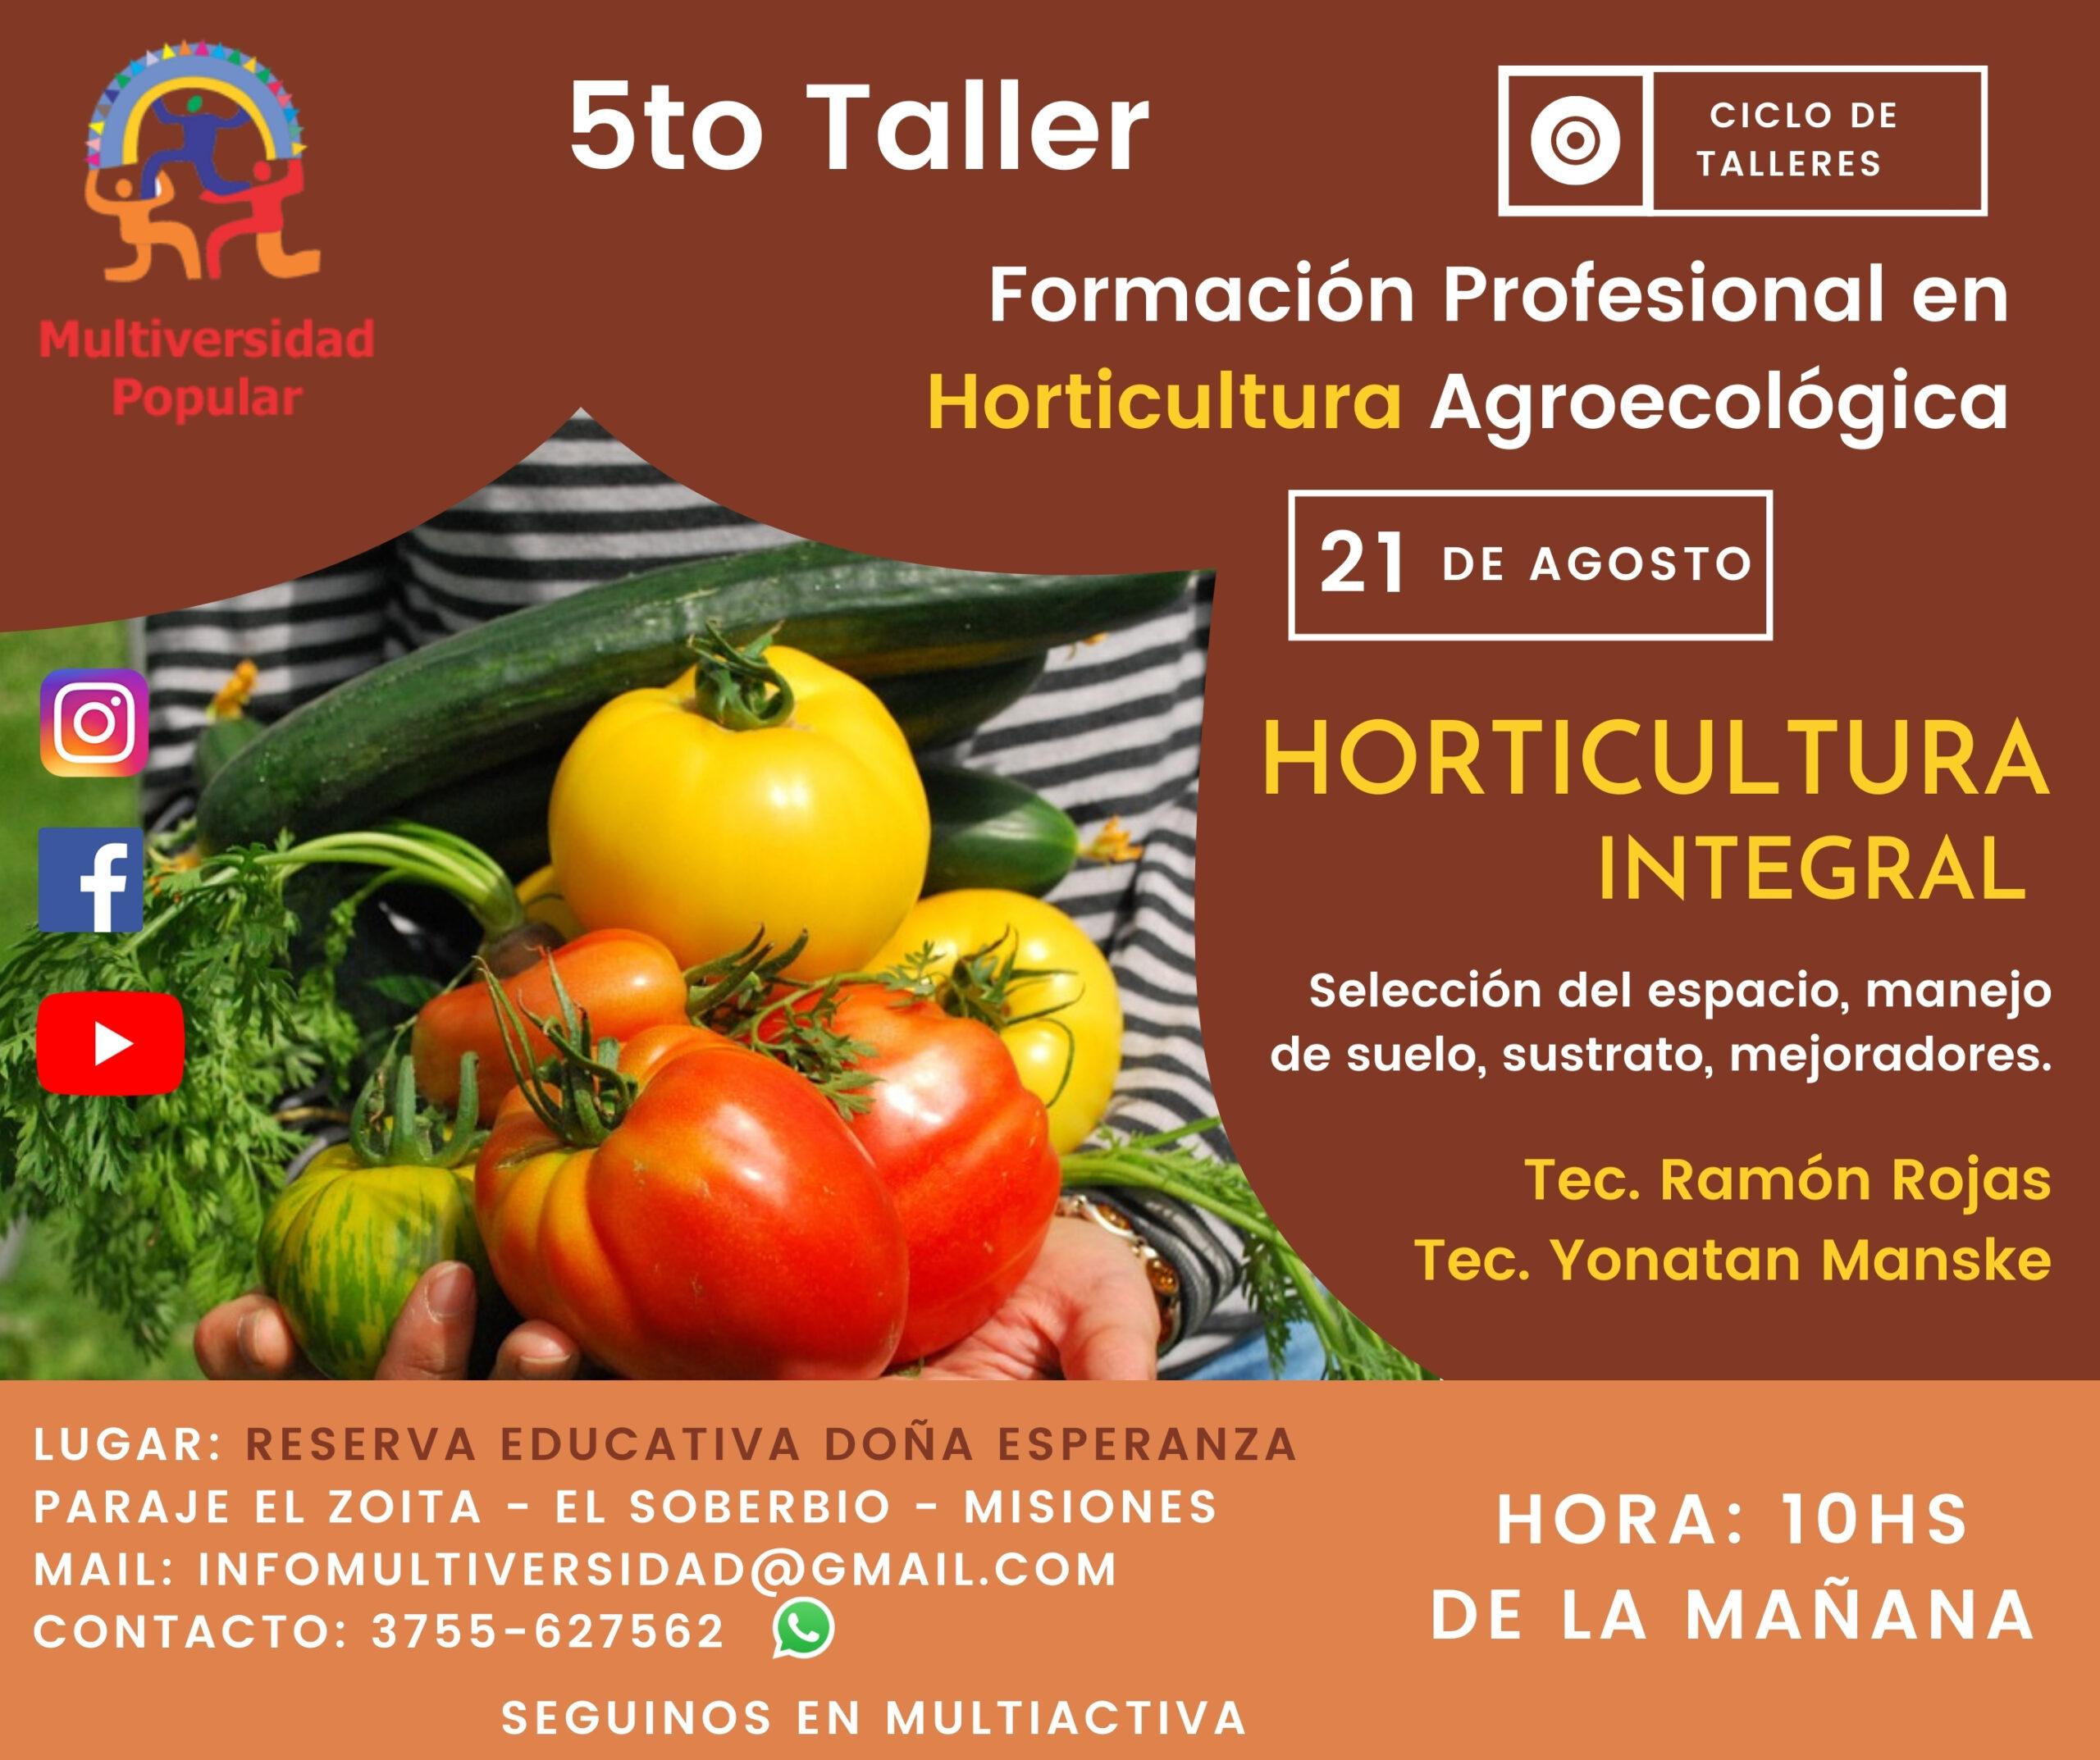 5to Taller – Horticultura Integral